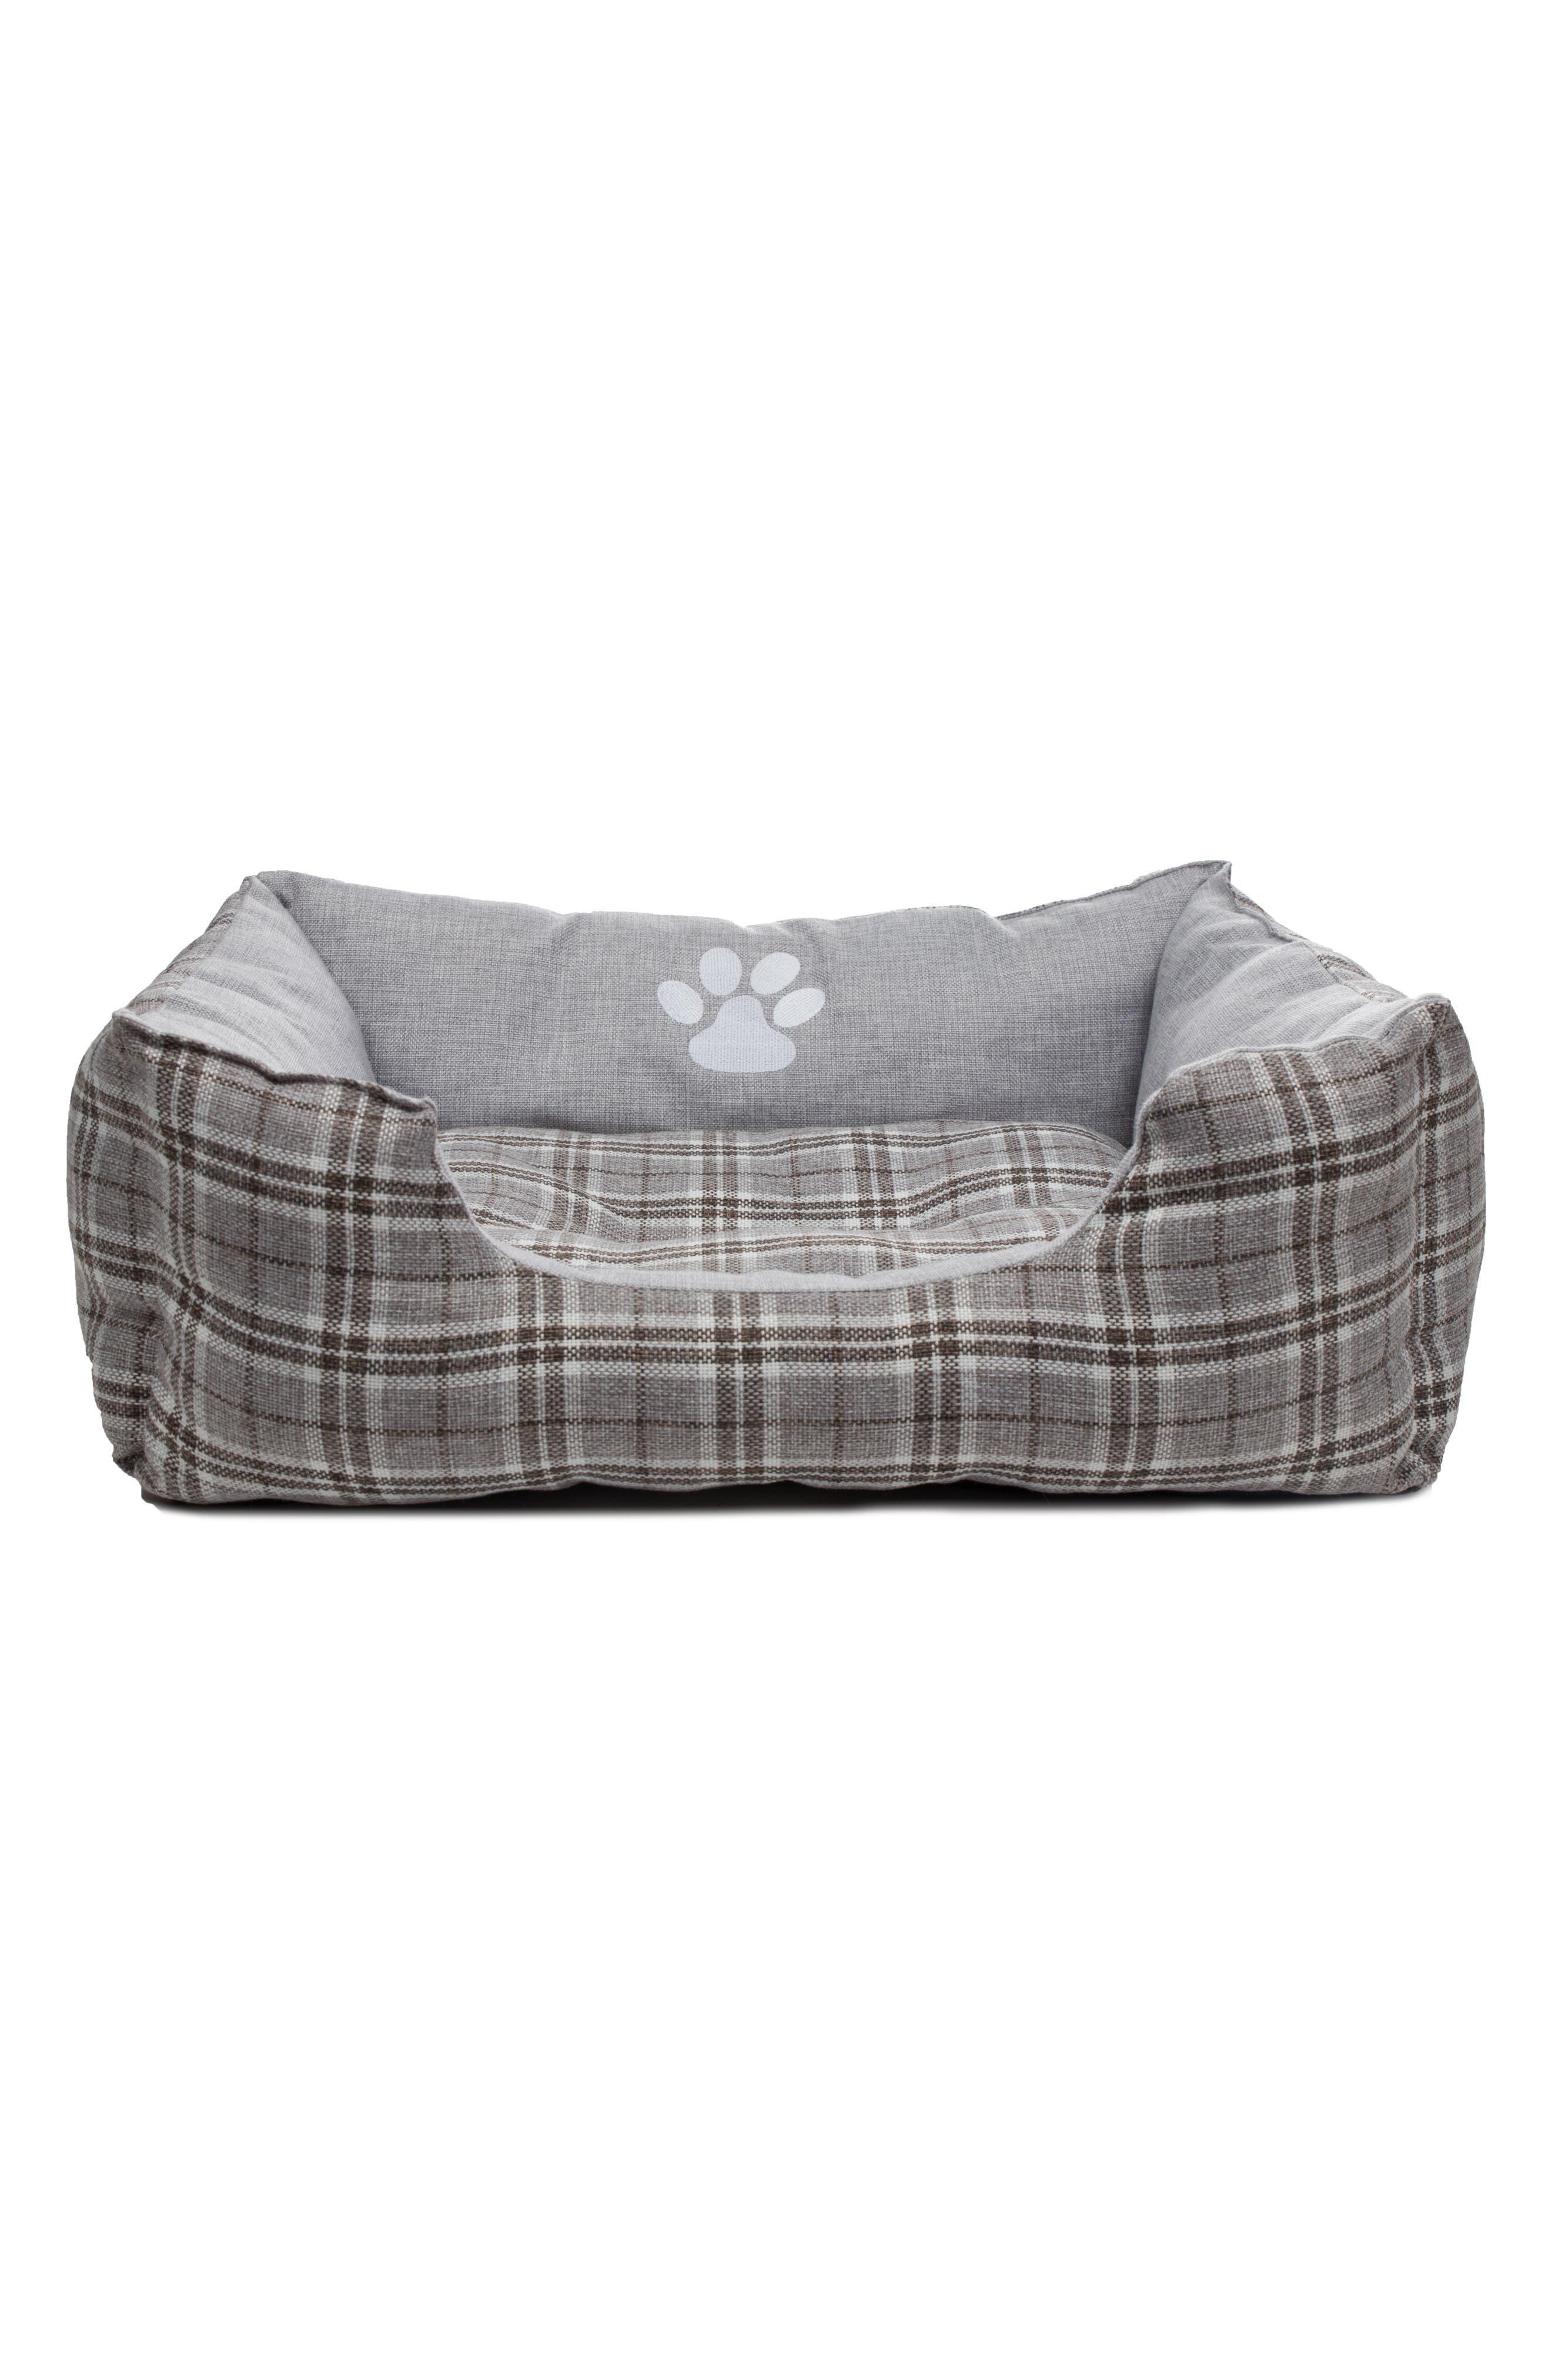 Harlee Large Square Pet Bed,                             Main thumbnail 1, color,                             Grey